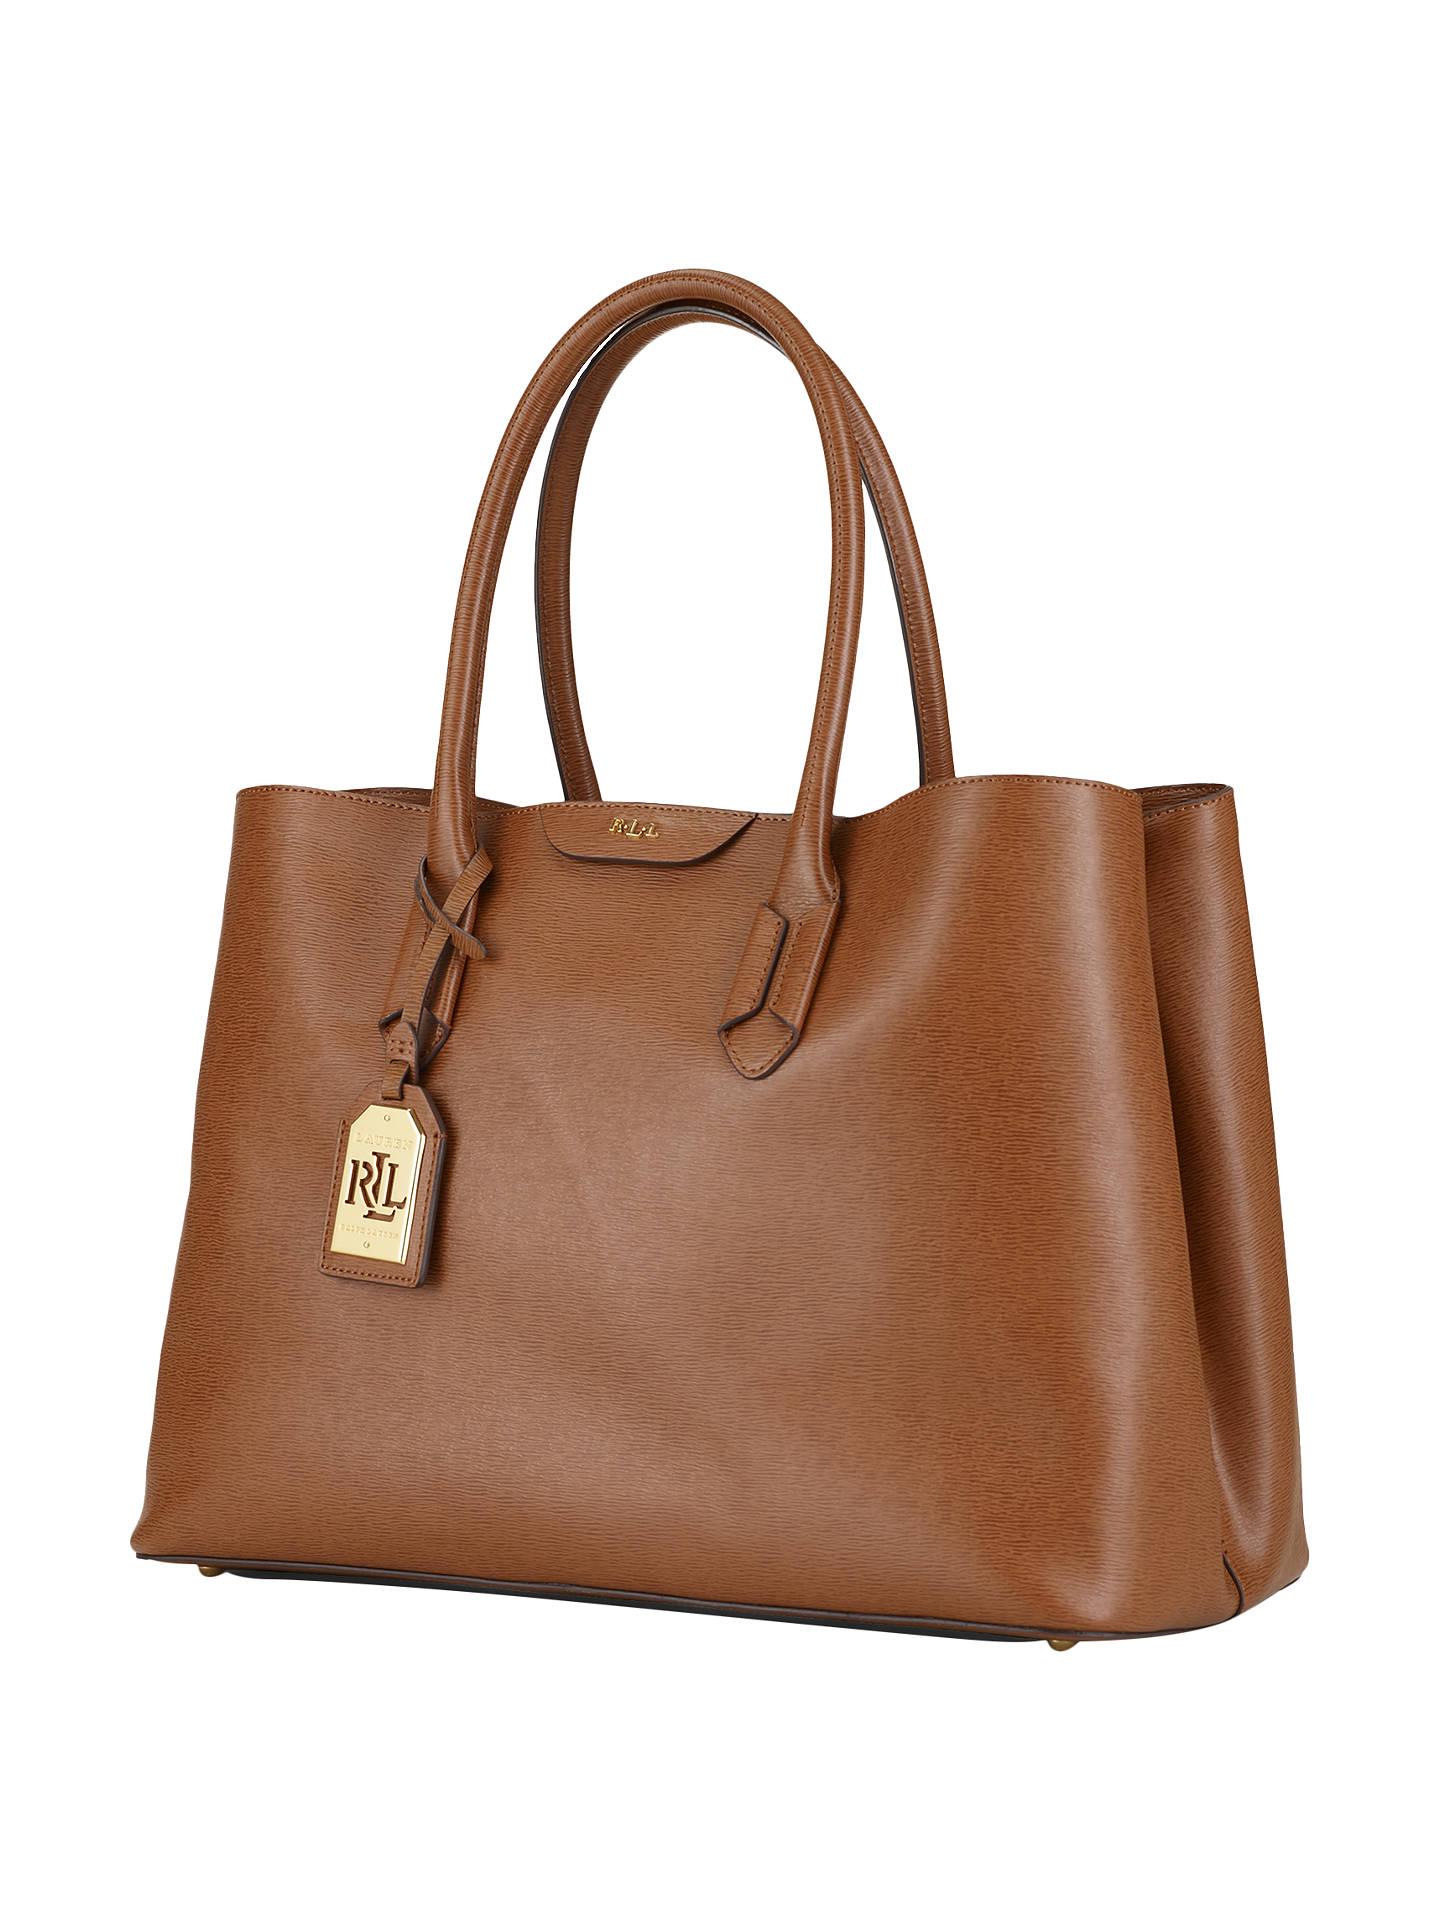 f1e70189a0c BuyLauren Ralph Lauren City Tote Bag, Lauren Tan Online at johnlewis.com ...